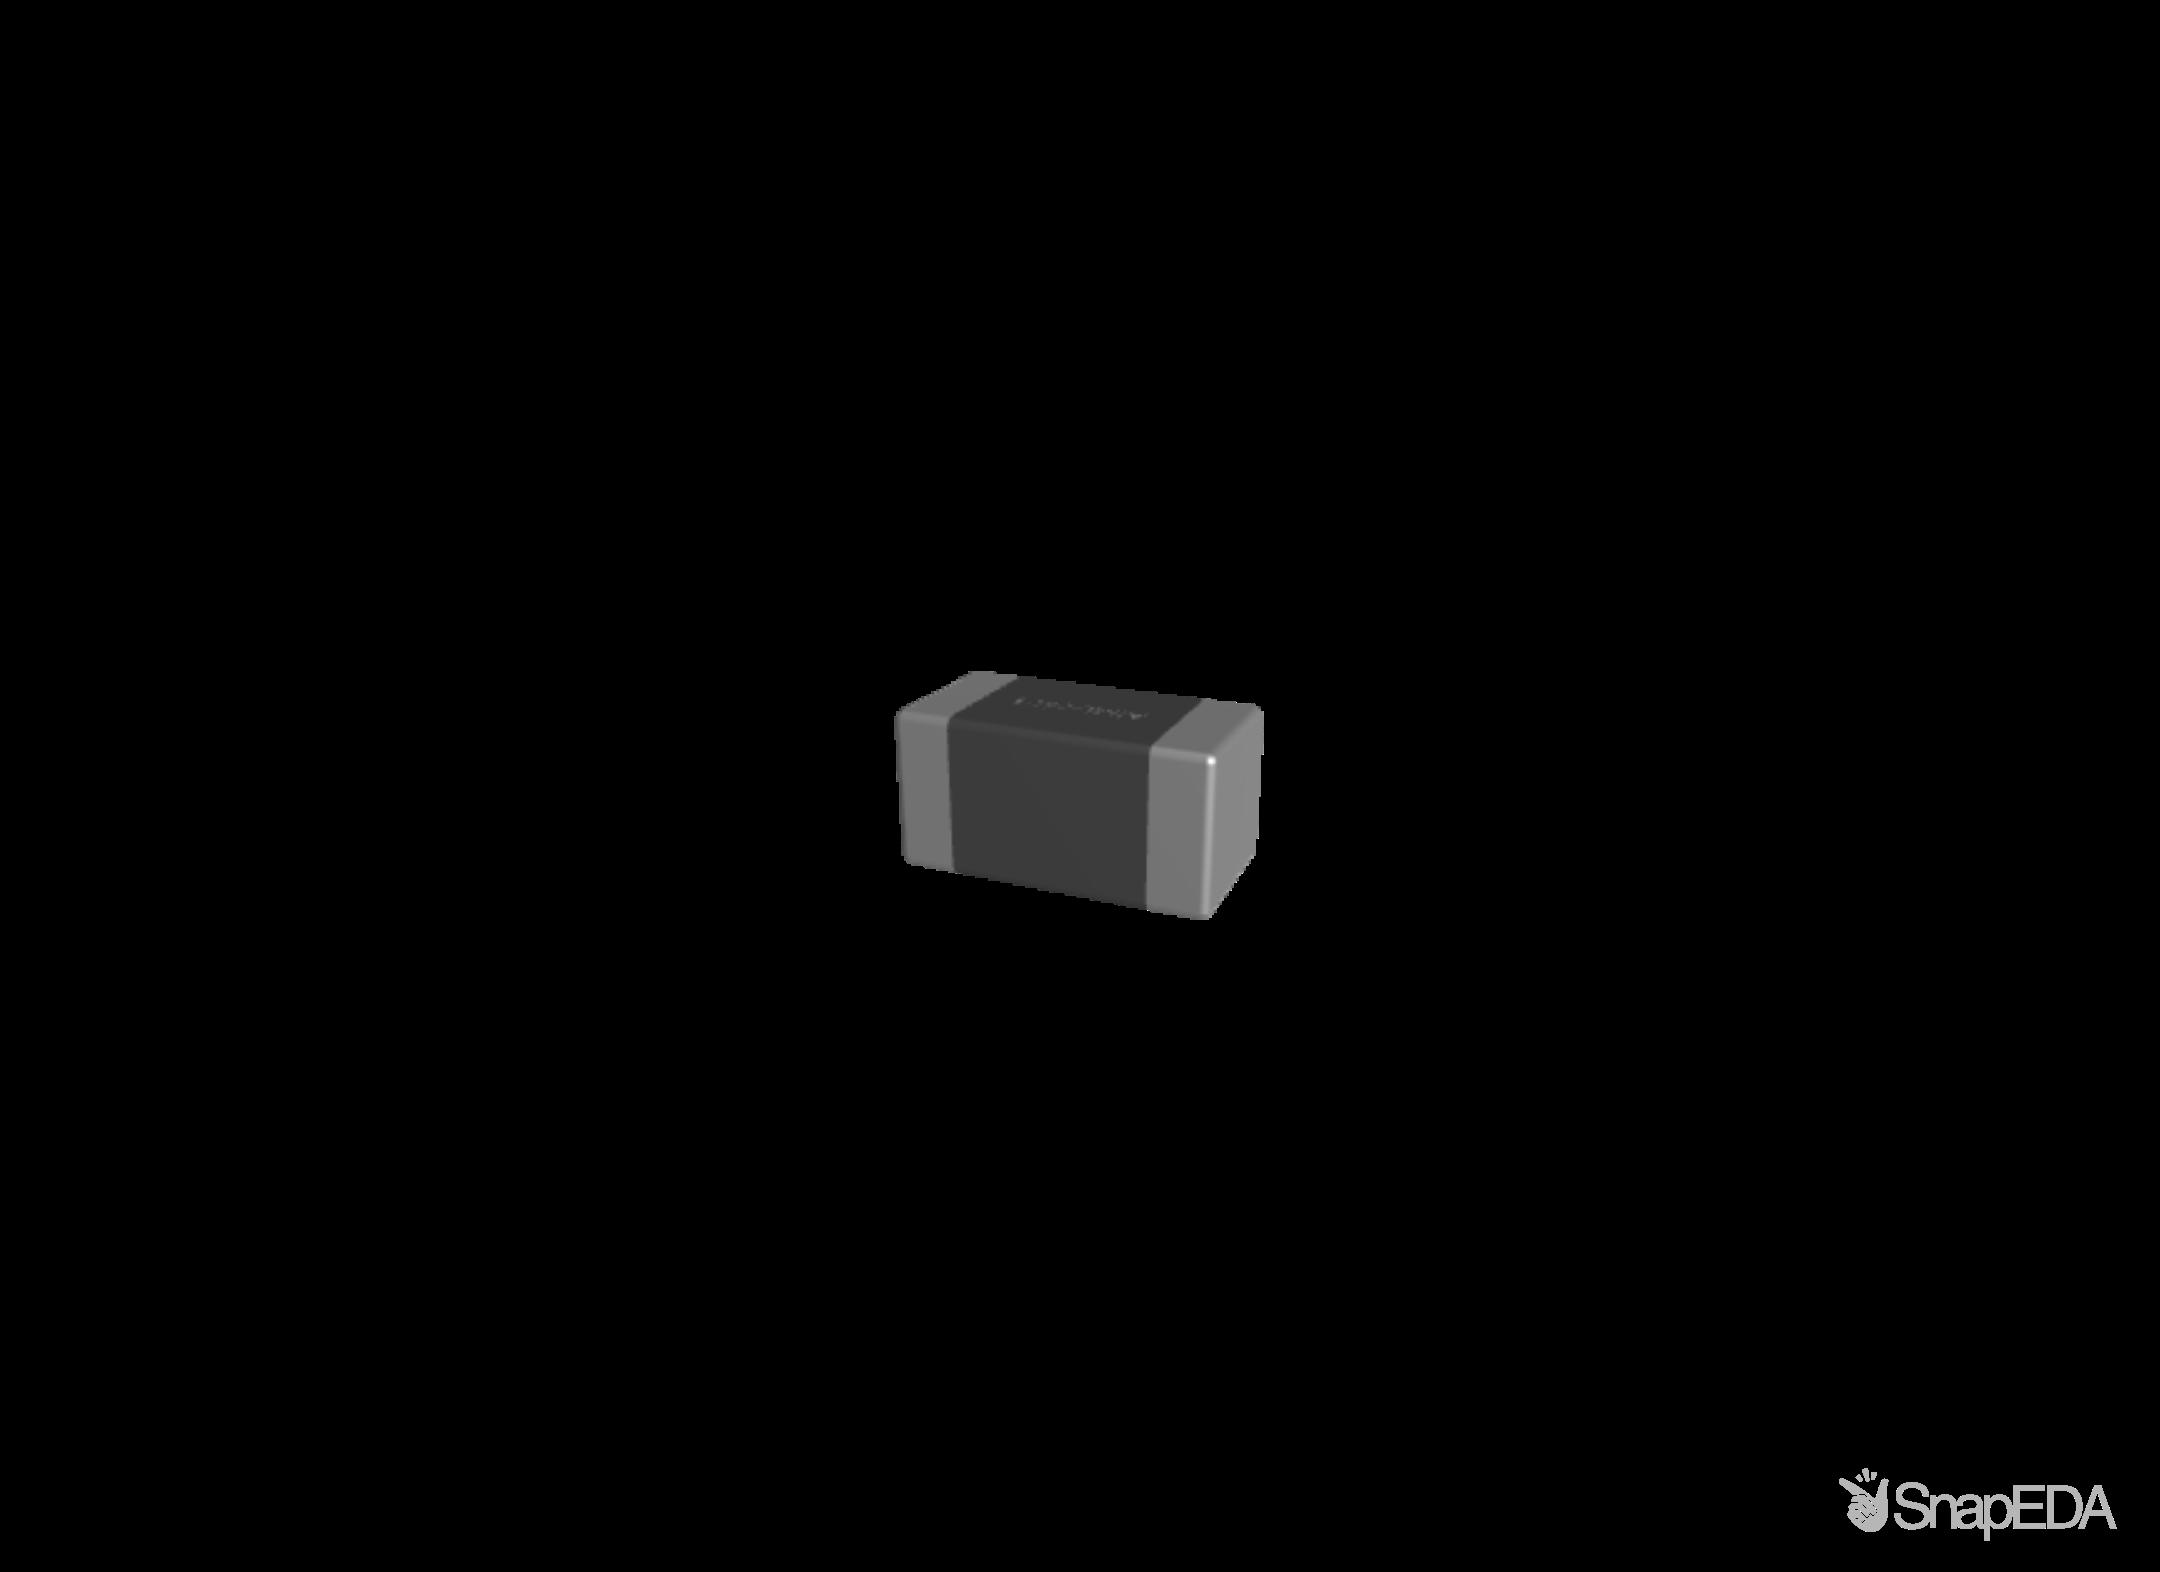 ASMCI-0603-4R7M-T 3D Model